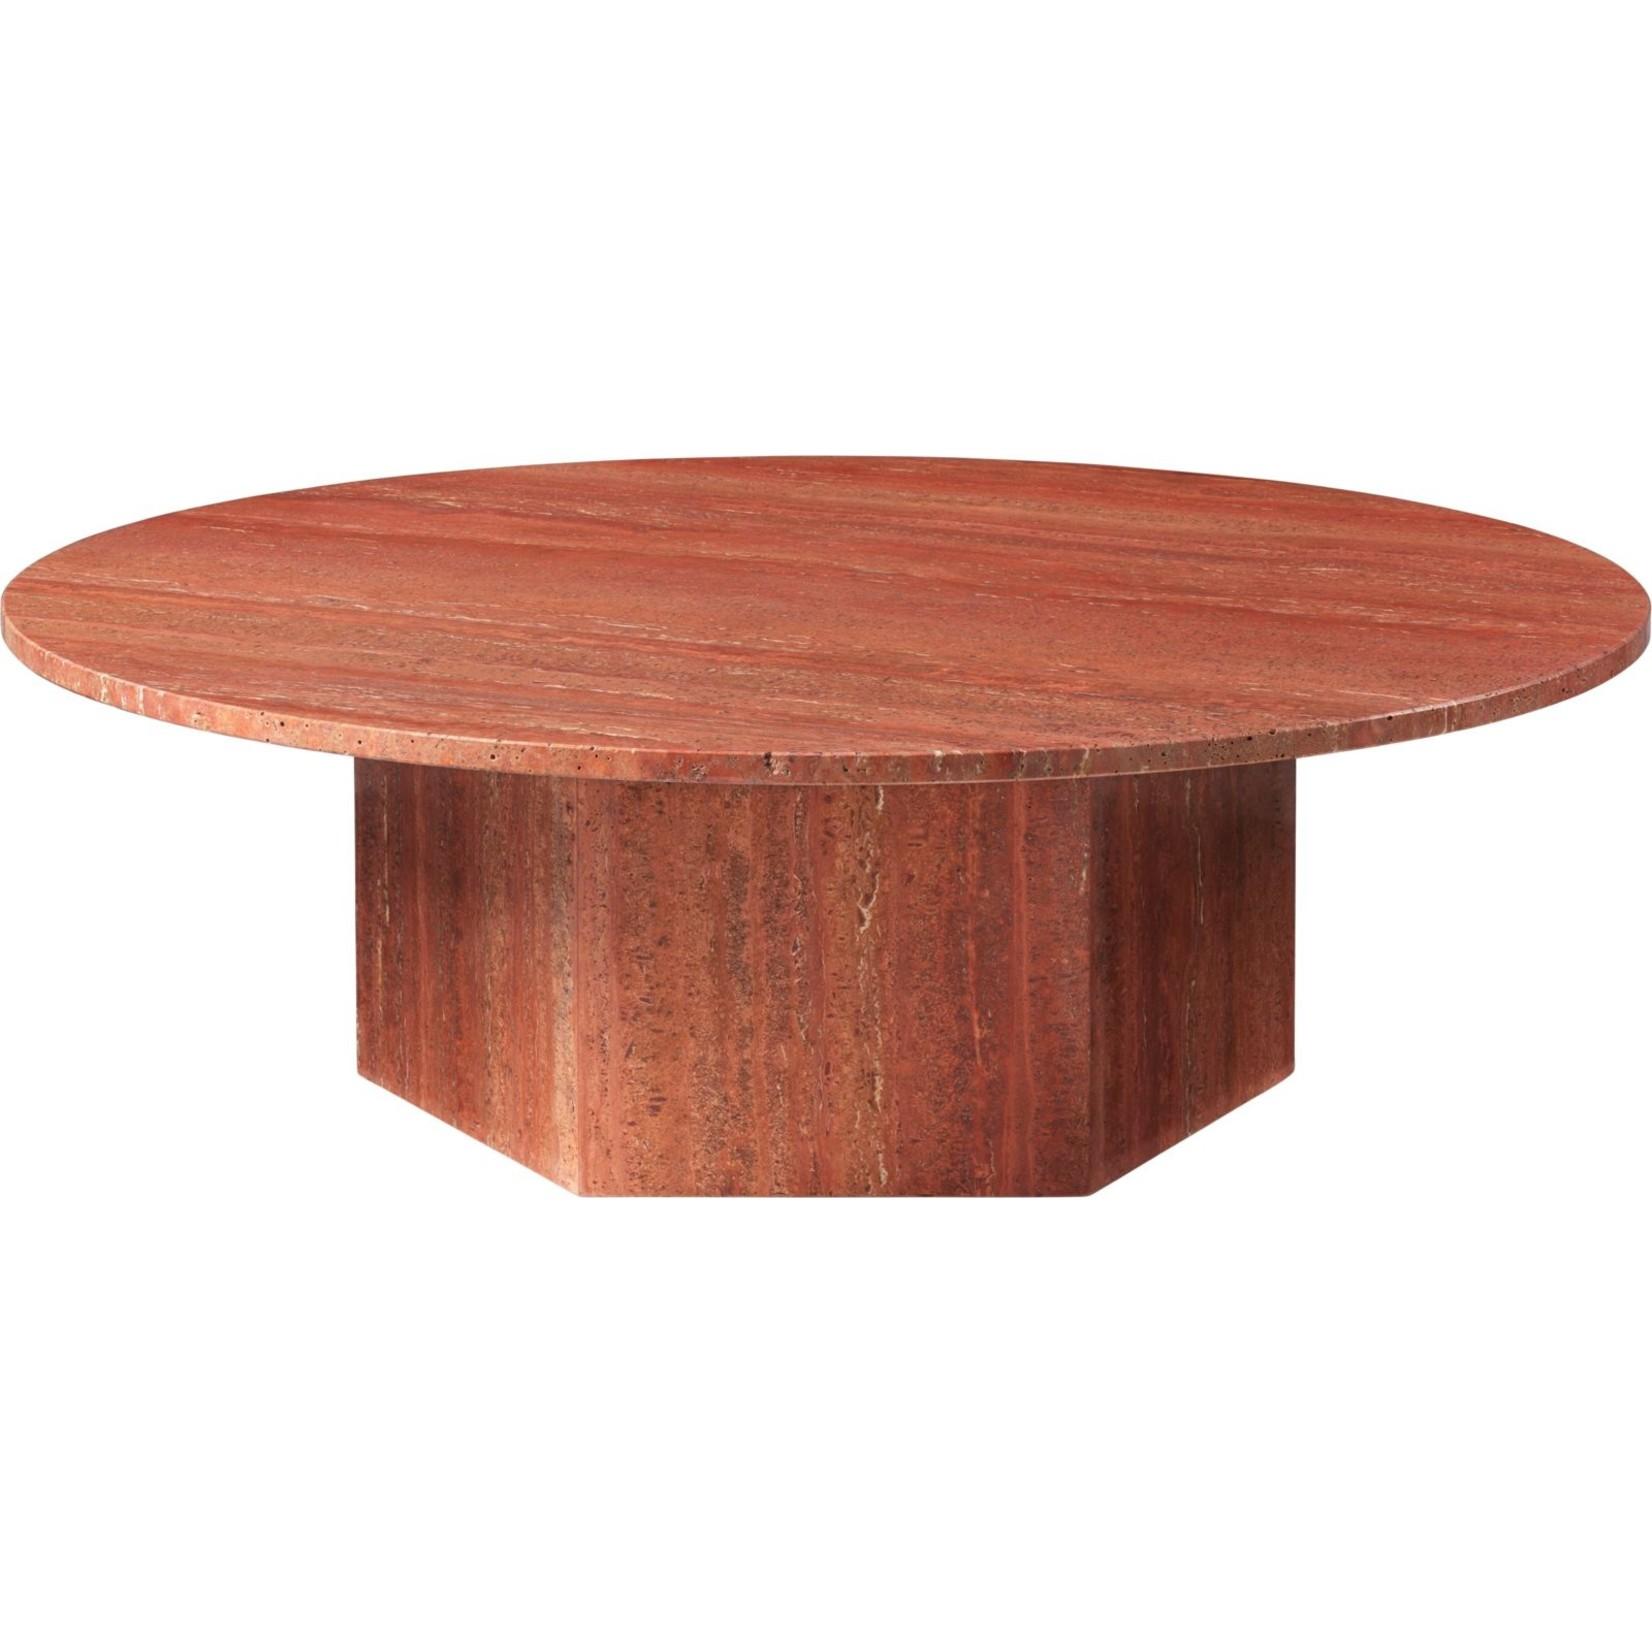 Gubi Epic Coffee Table Round Ø110 | Red Travertine